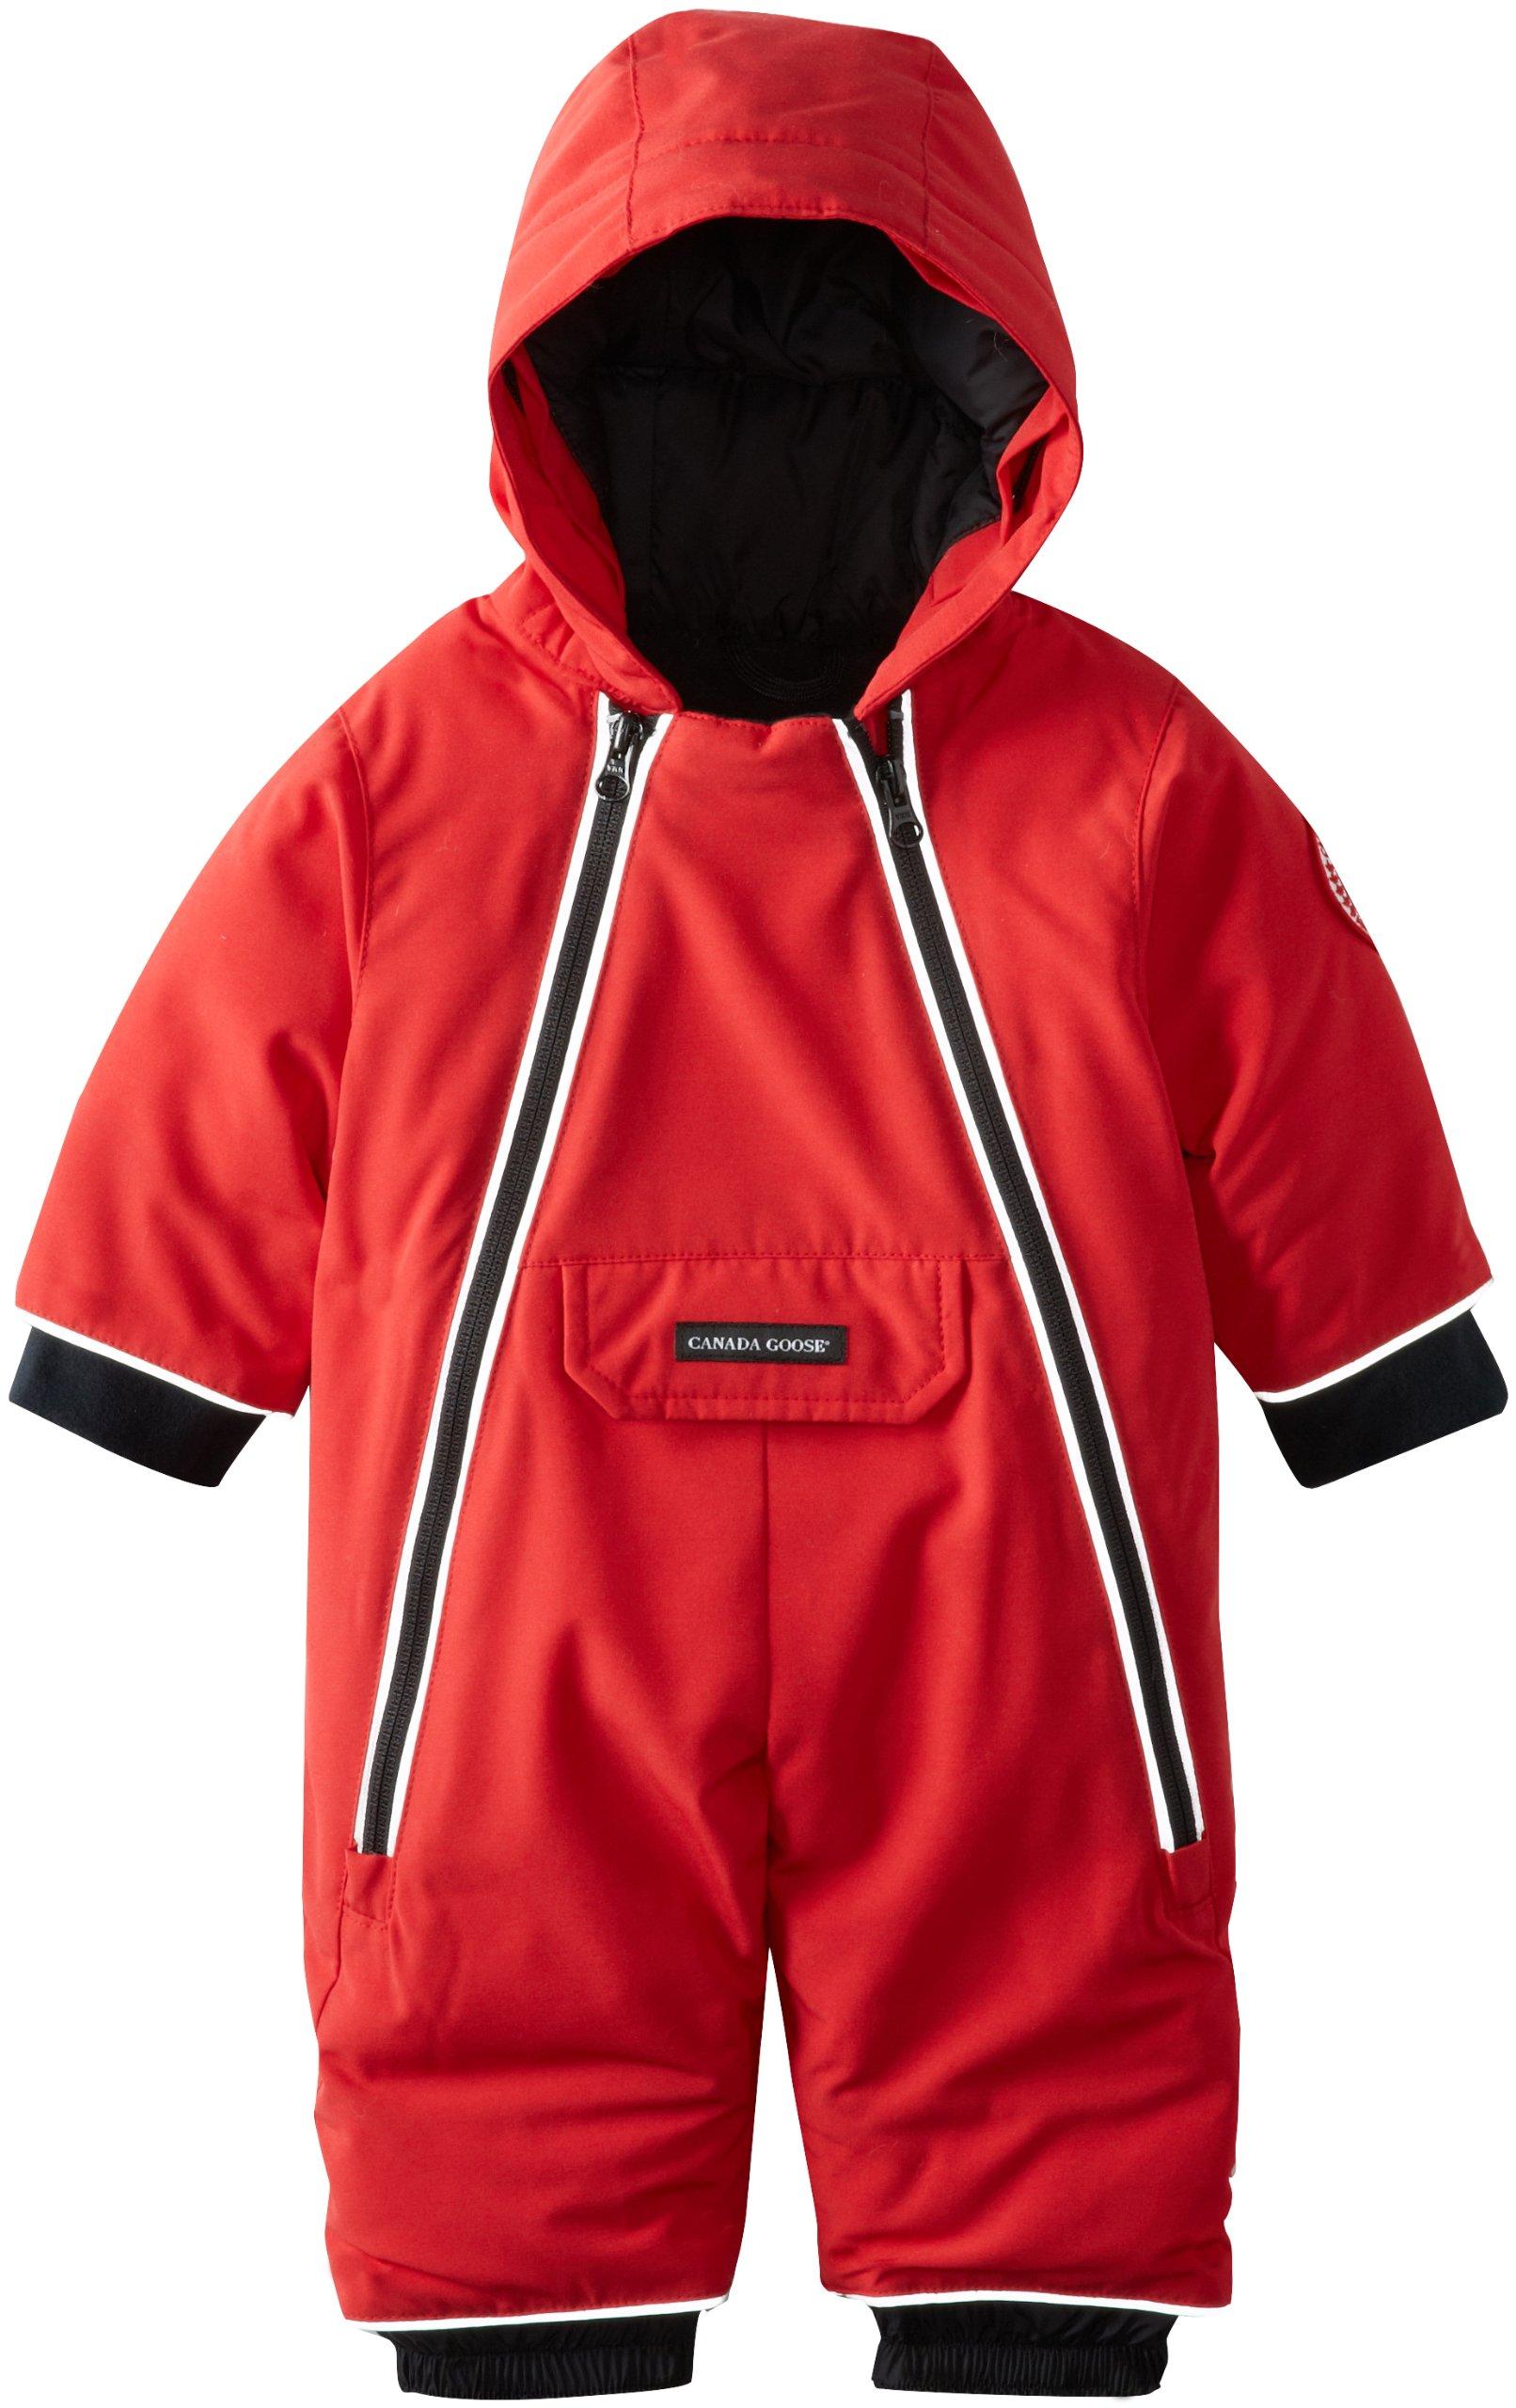 Canada Goose Baby SnowSuit amazon